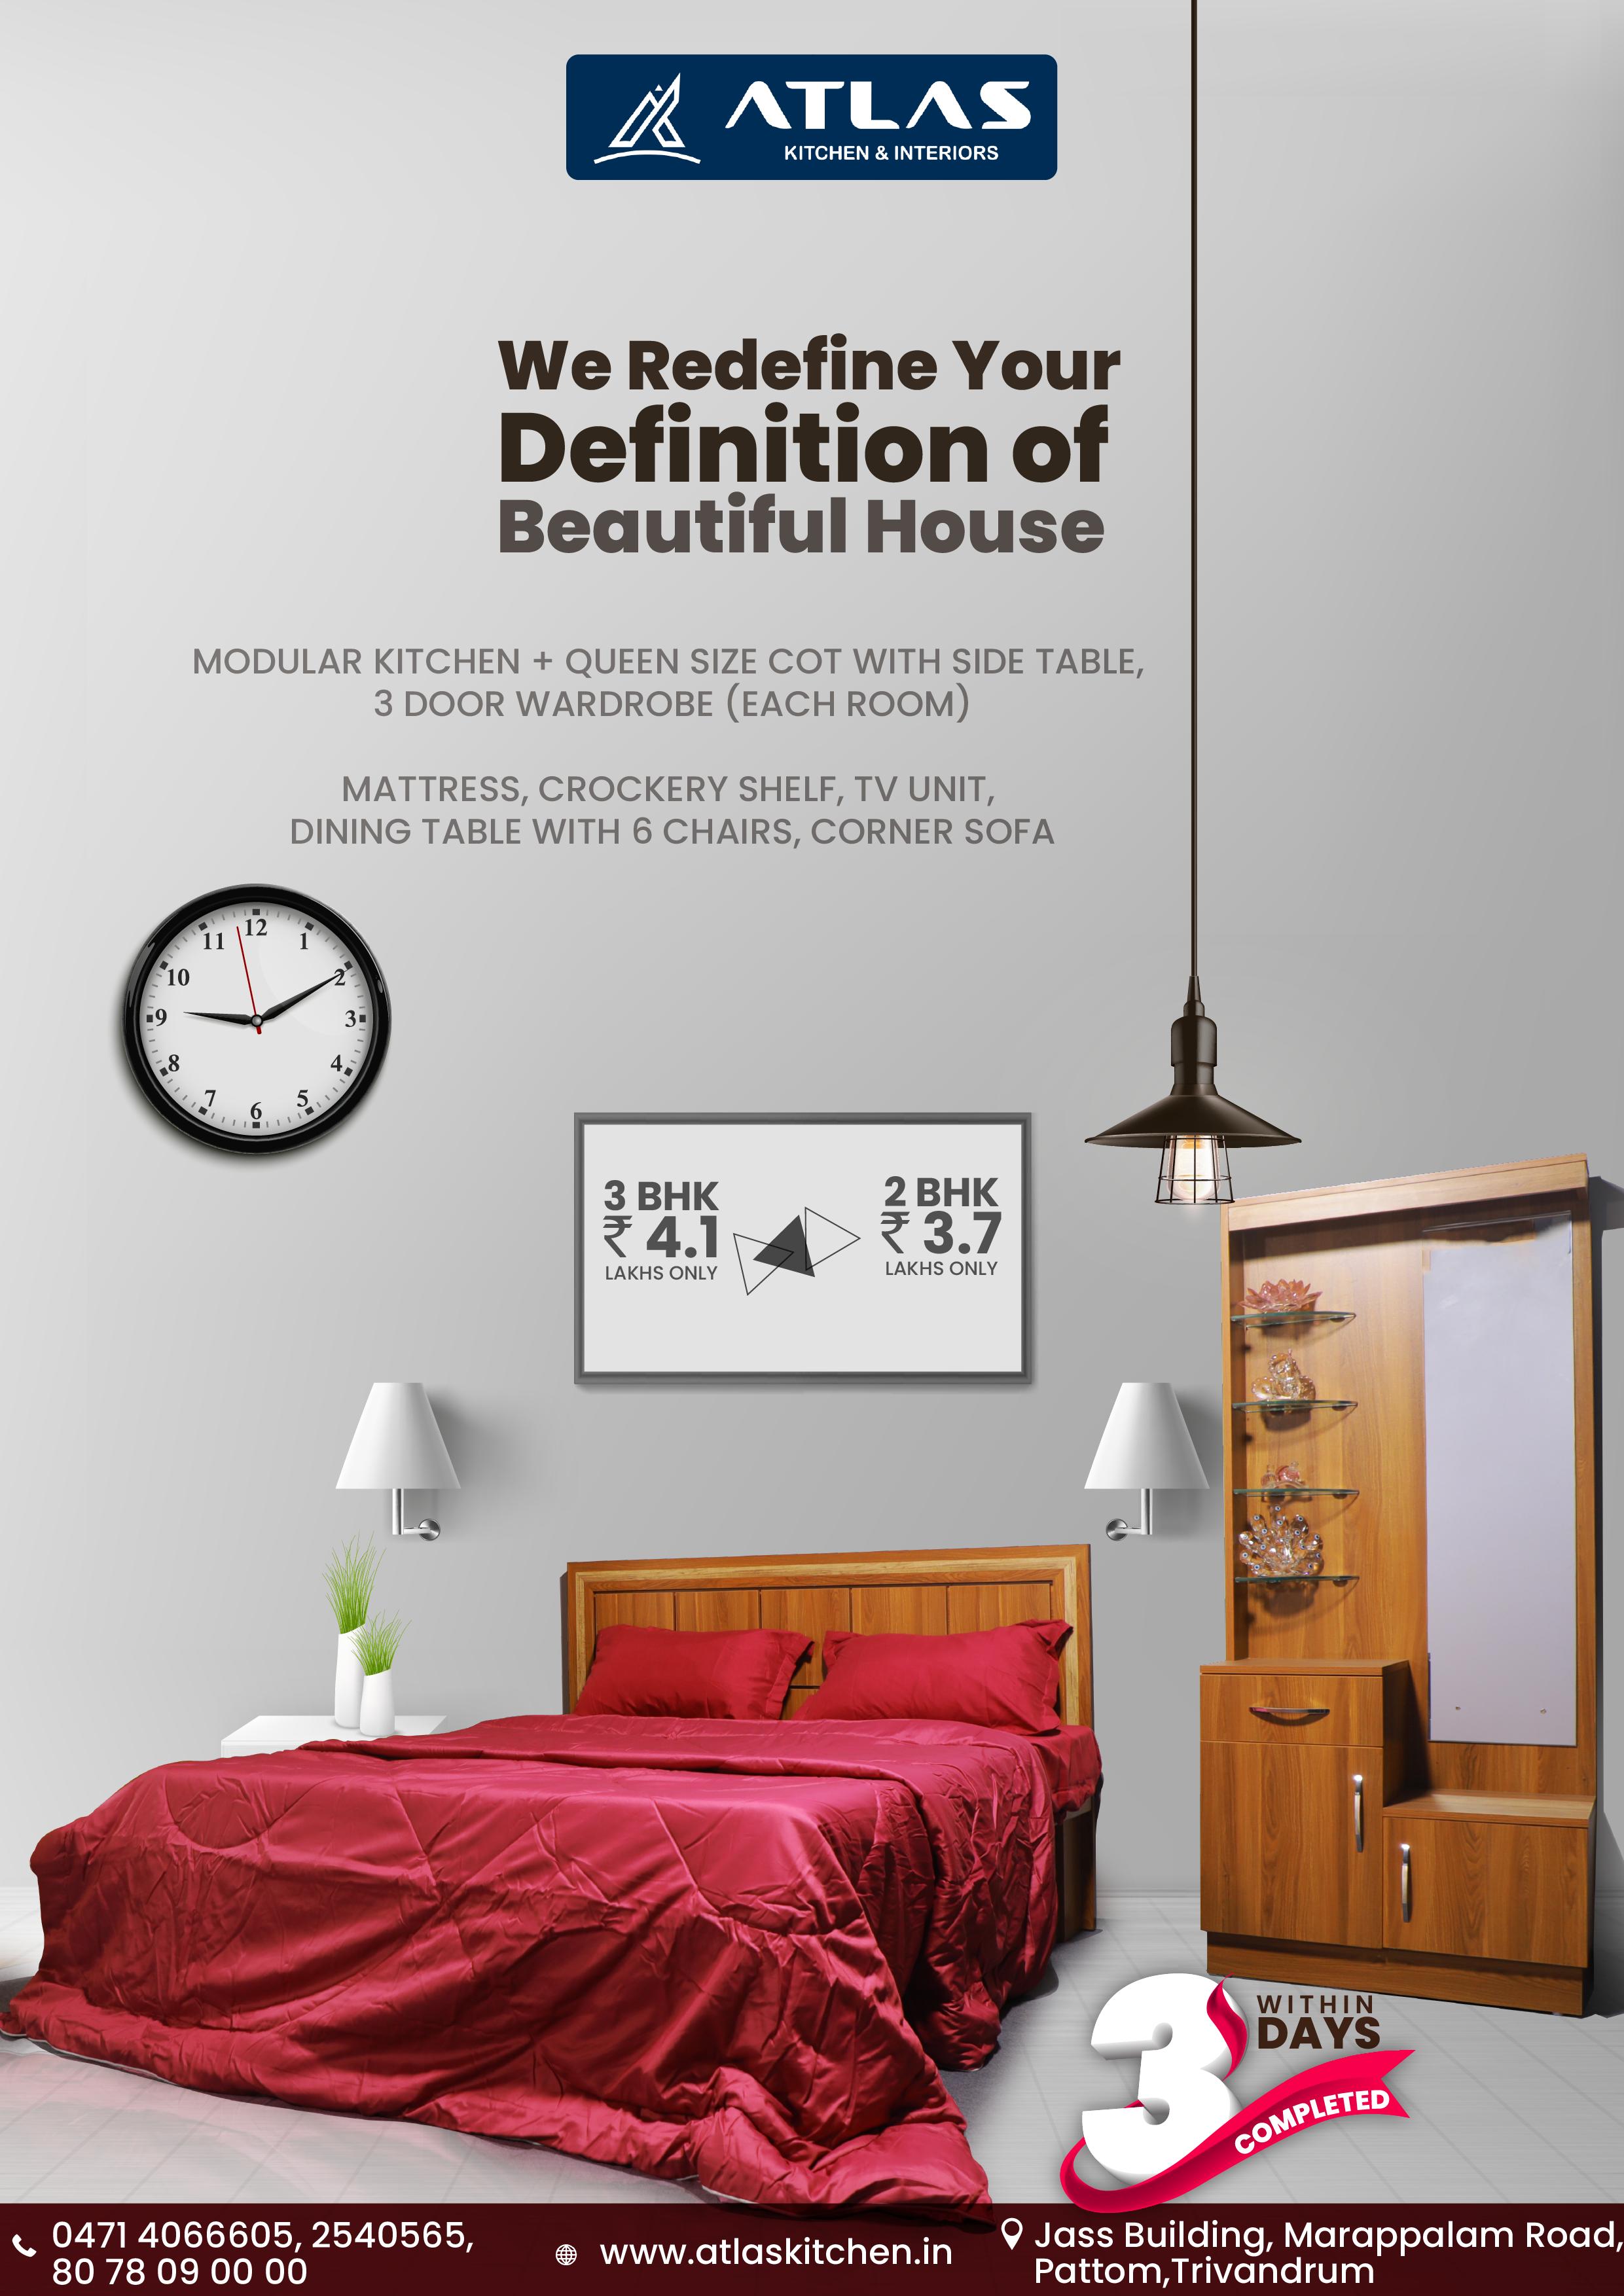 Interior Design Social Media Poster Design In 2020 Interior Architecture Design Design Interior